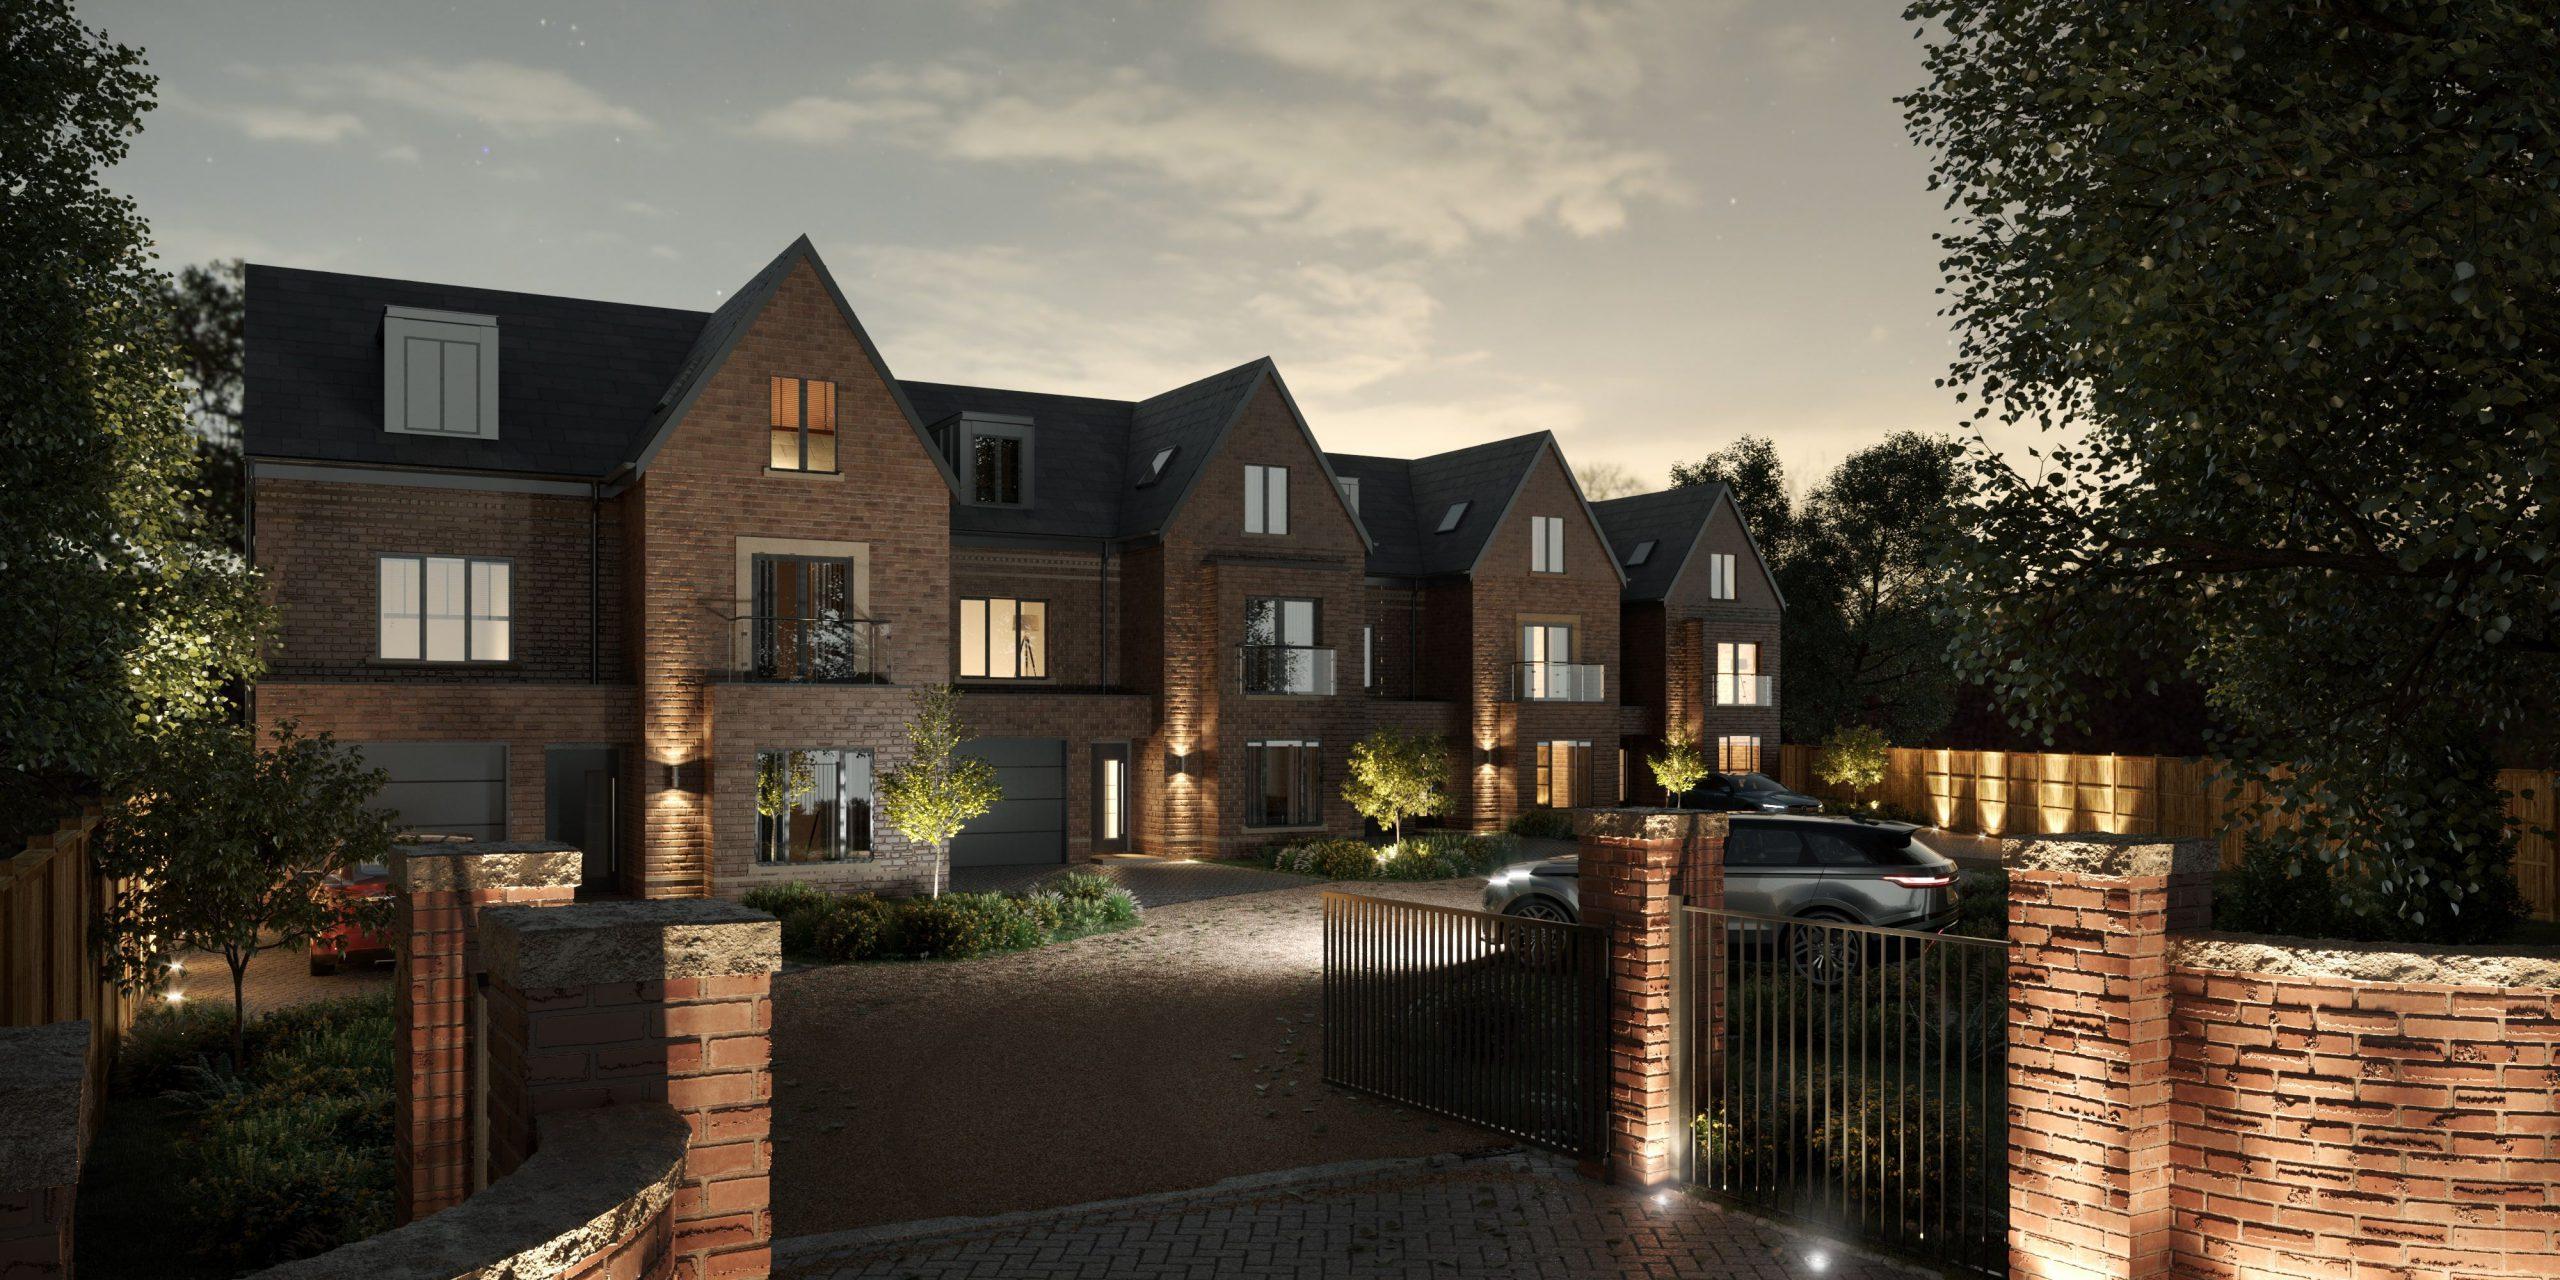 Mulberry Park - private luxury home development - bramhall, cheshire - architectural visualsiation night scene